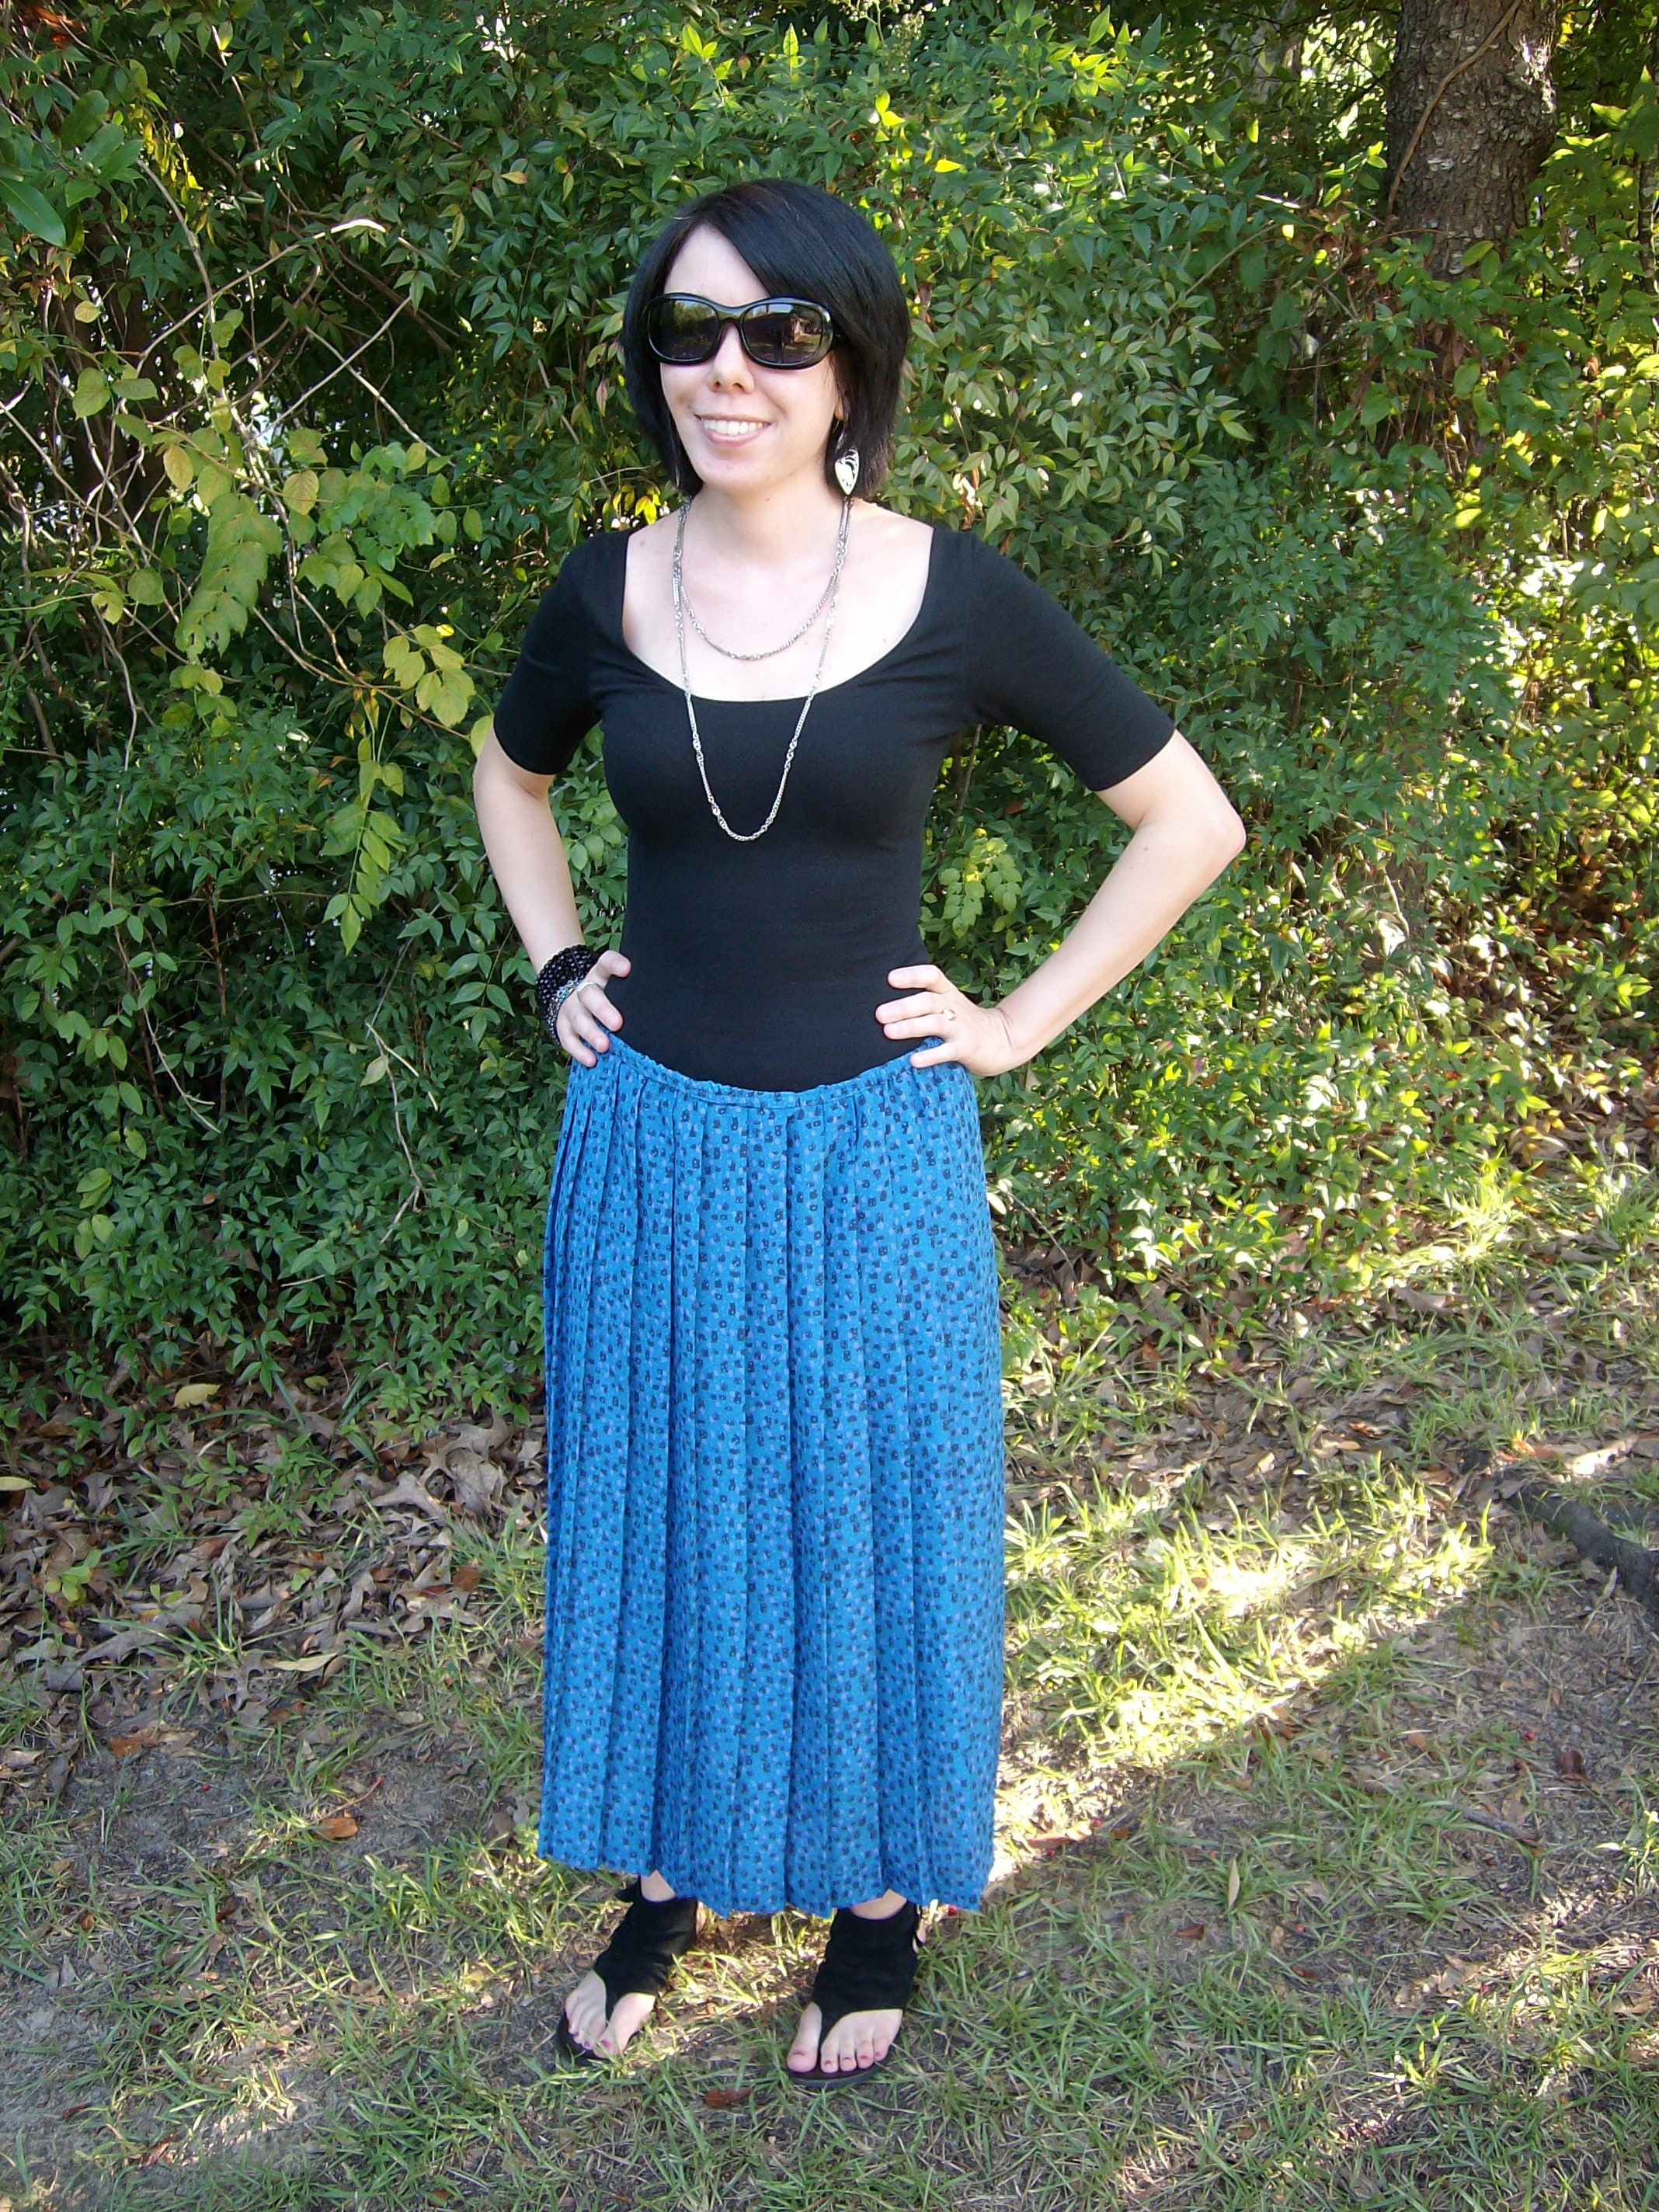 Day 33: A Royal Skirt 6